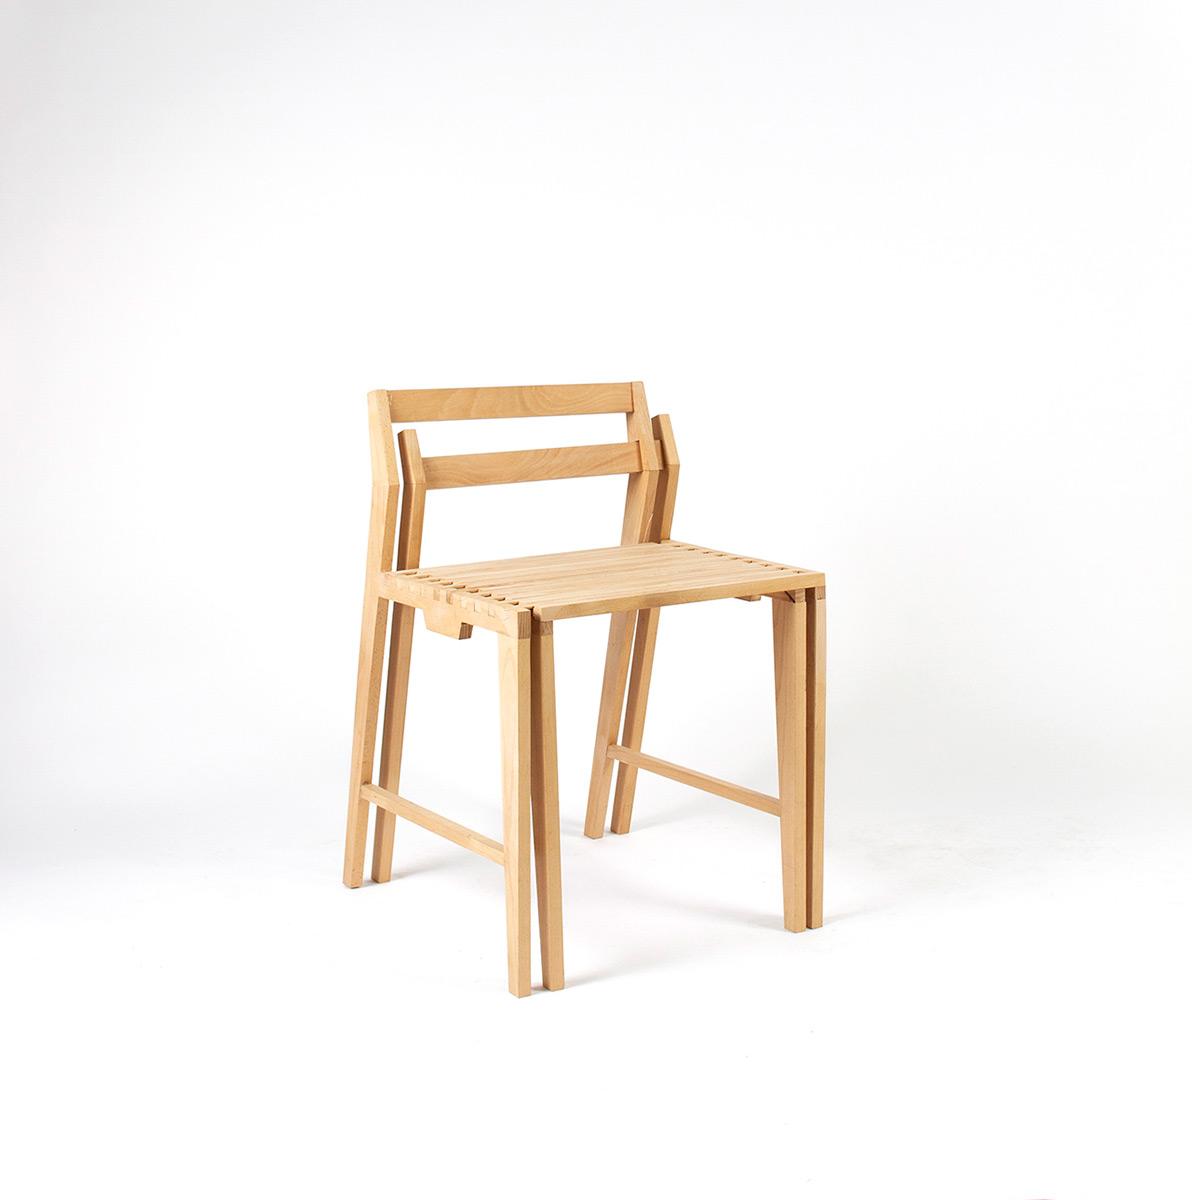 1-2-Chair-Rabea-Gebler-01